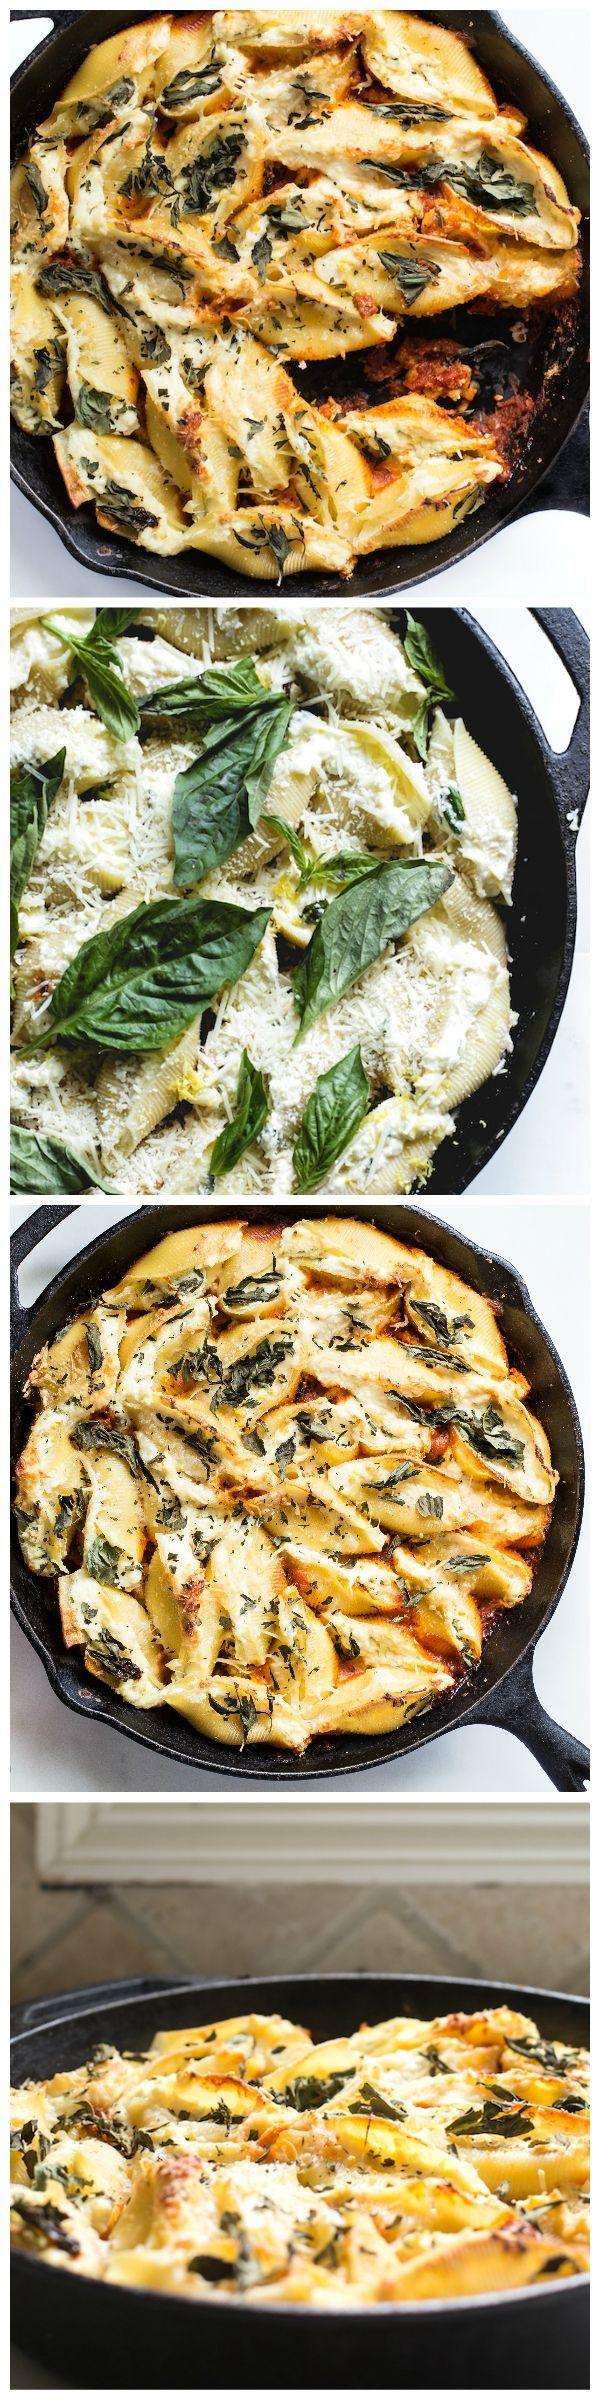 Stuffed Ricotta Parmesan Shells with Roasted Cauliflower and Bertolli Tomato & Basil Sauce! @Bertolli - www.bertolli.com #vivabertolli #yoursummertuscantable